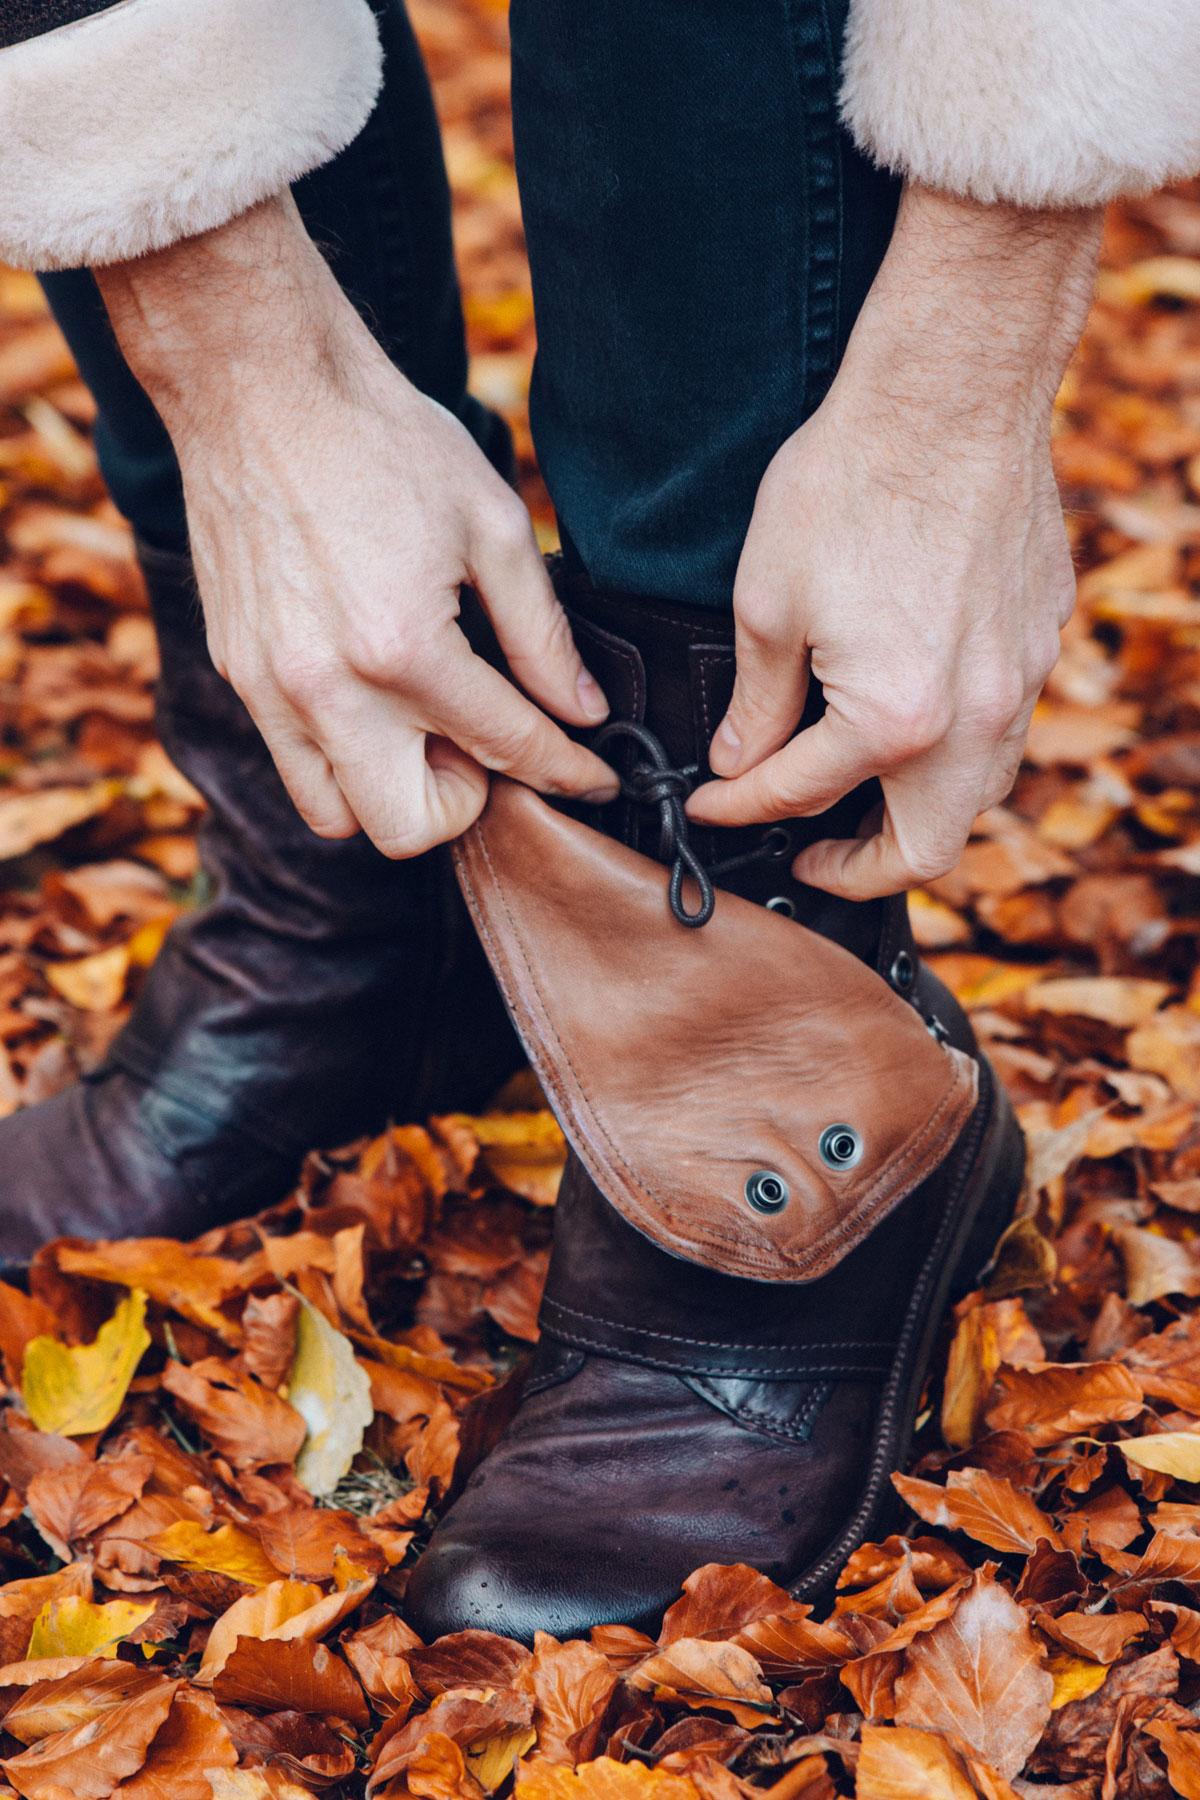 modeblog-maenner-lammfelljacke-lederjacke-as98-tasche-boots-herbstlook